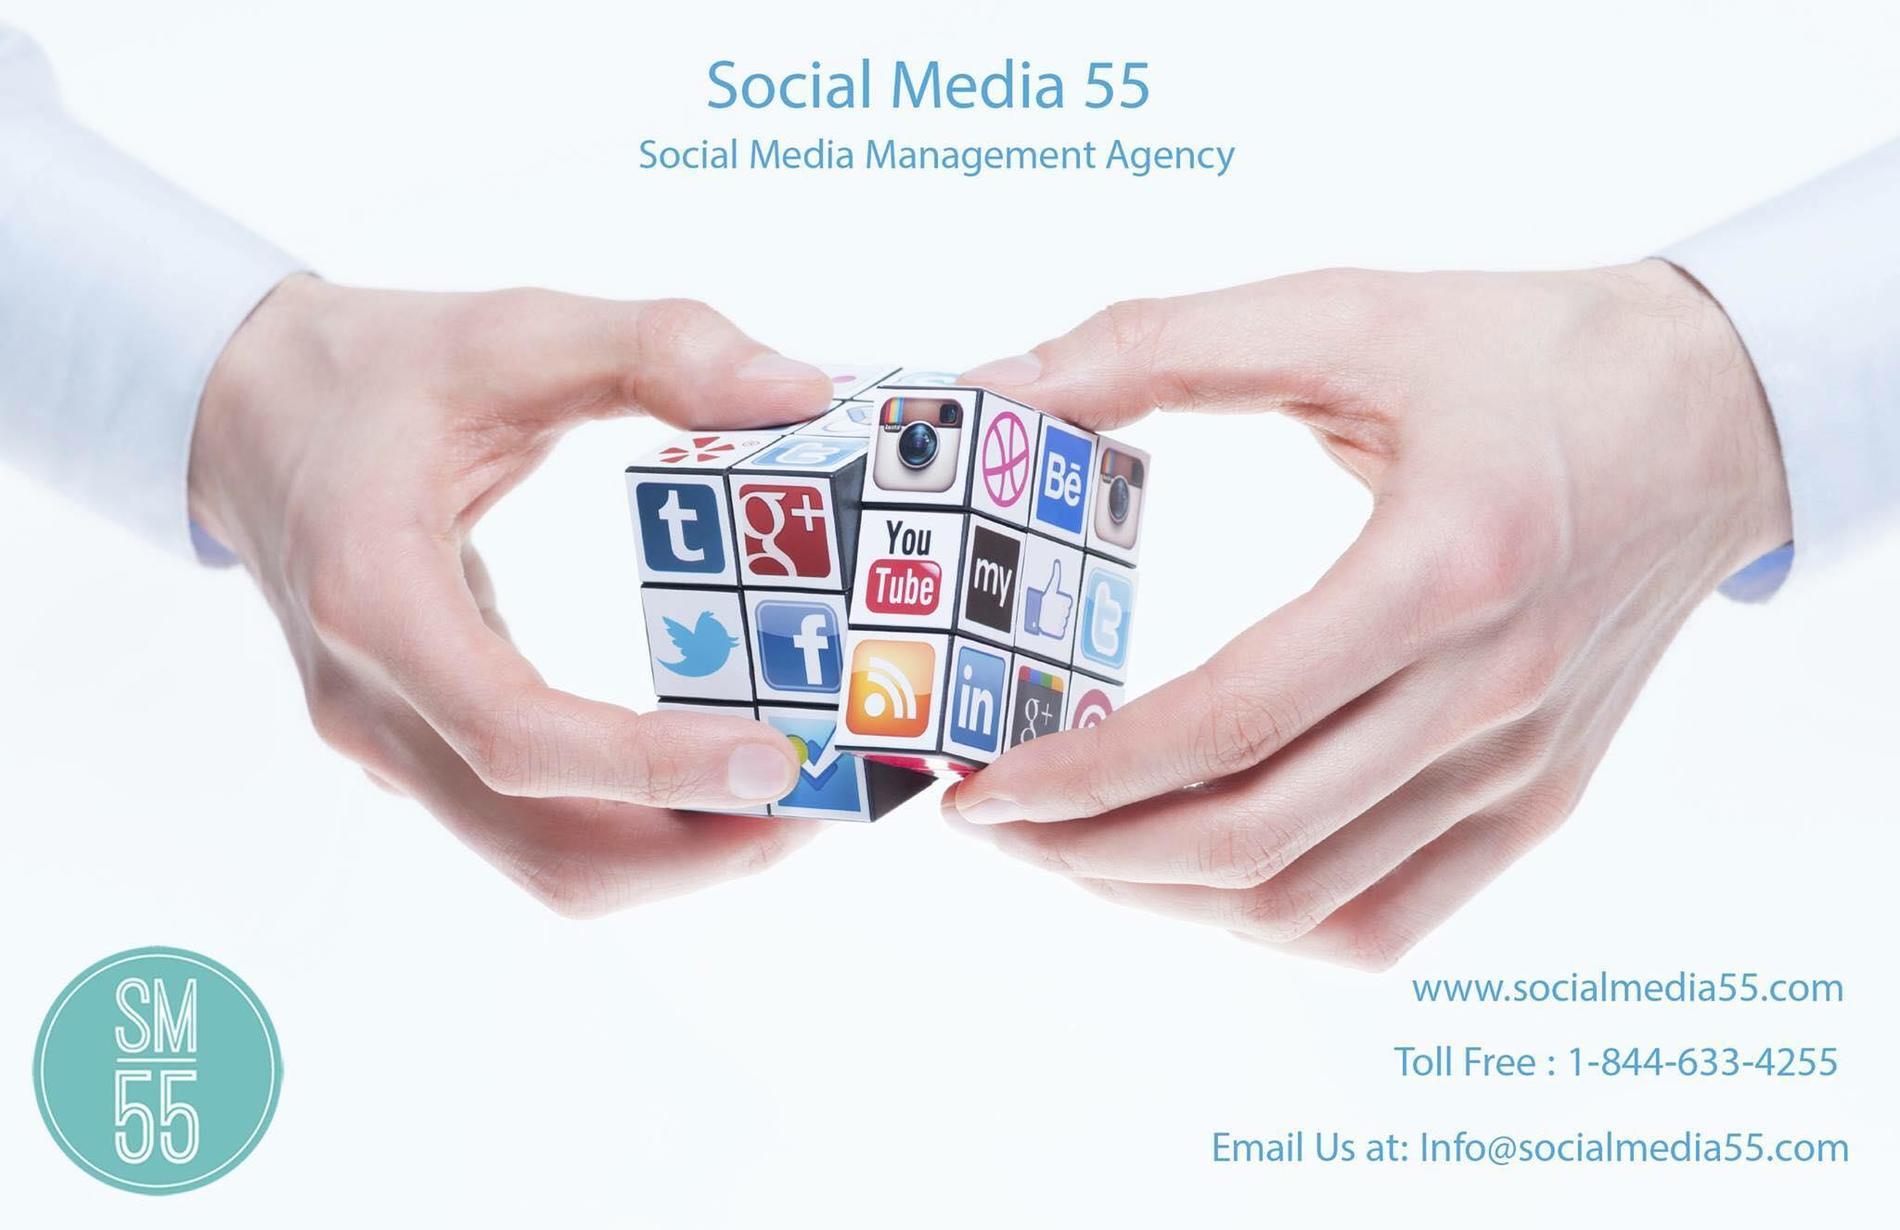 Social Media 55 image 12